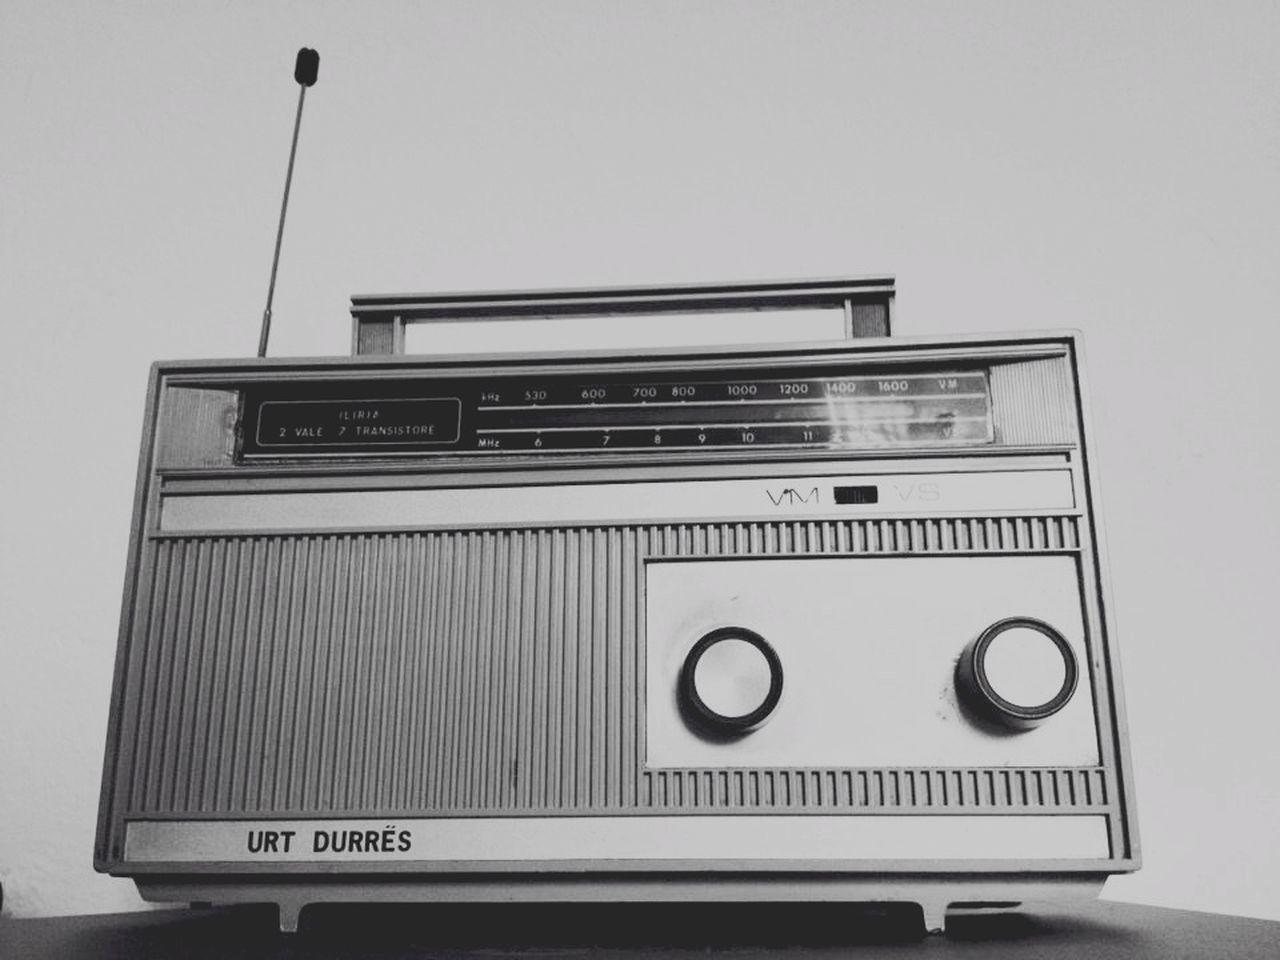 Radio Iliria Oldschool Oldradio Monochrome Black & White Blackandwhite Tirana Albania Durres